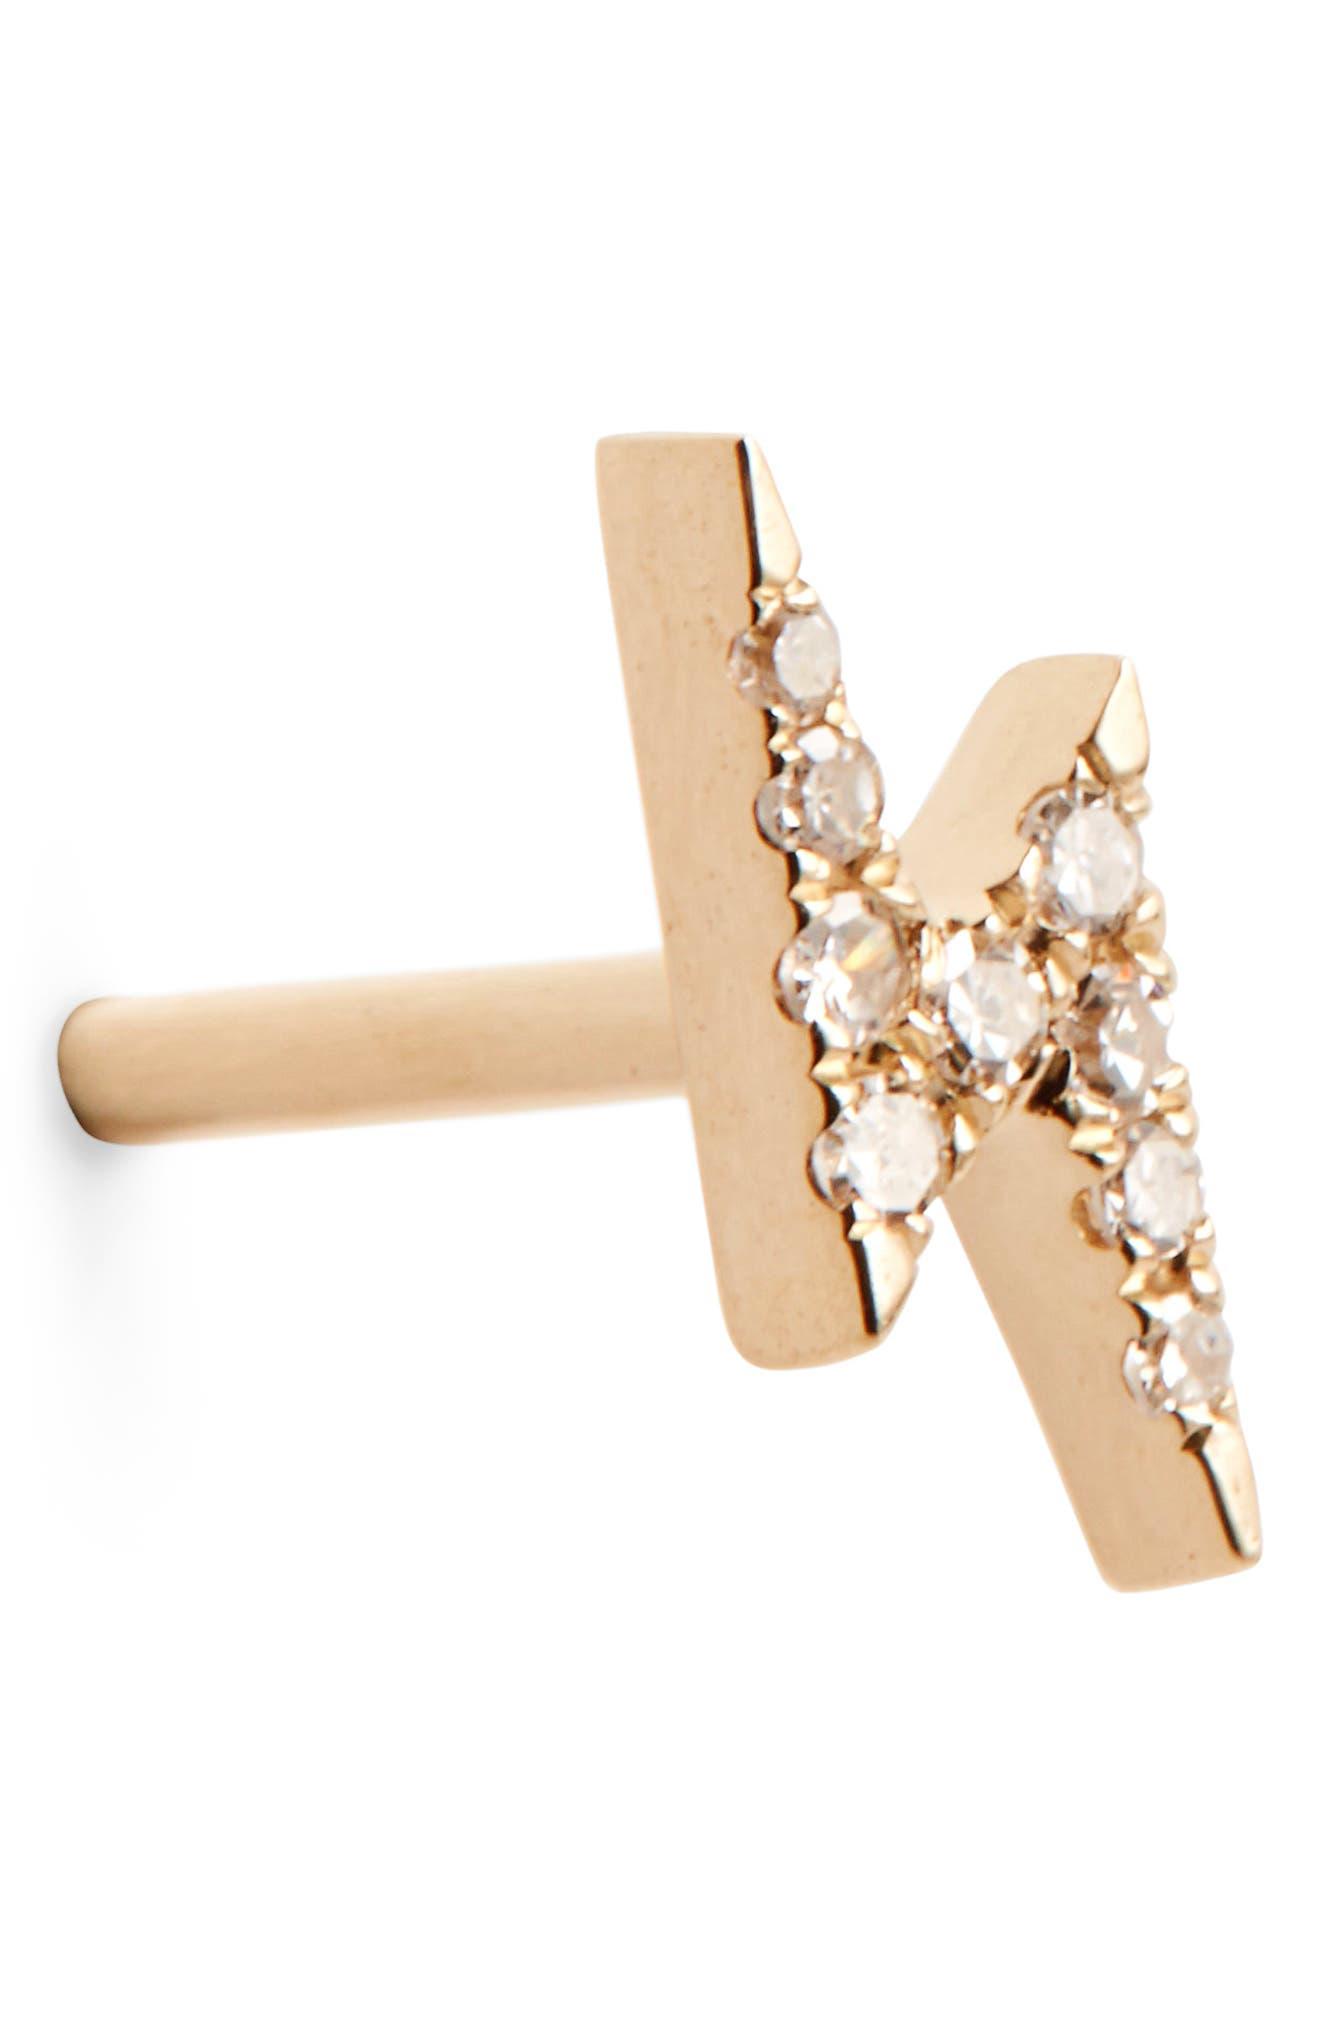 Diamond Stud Earrings,                             Alternate thumbnail 7, color,                             710